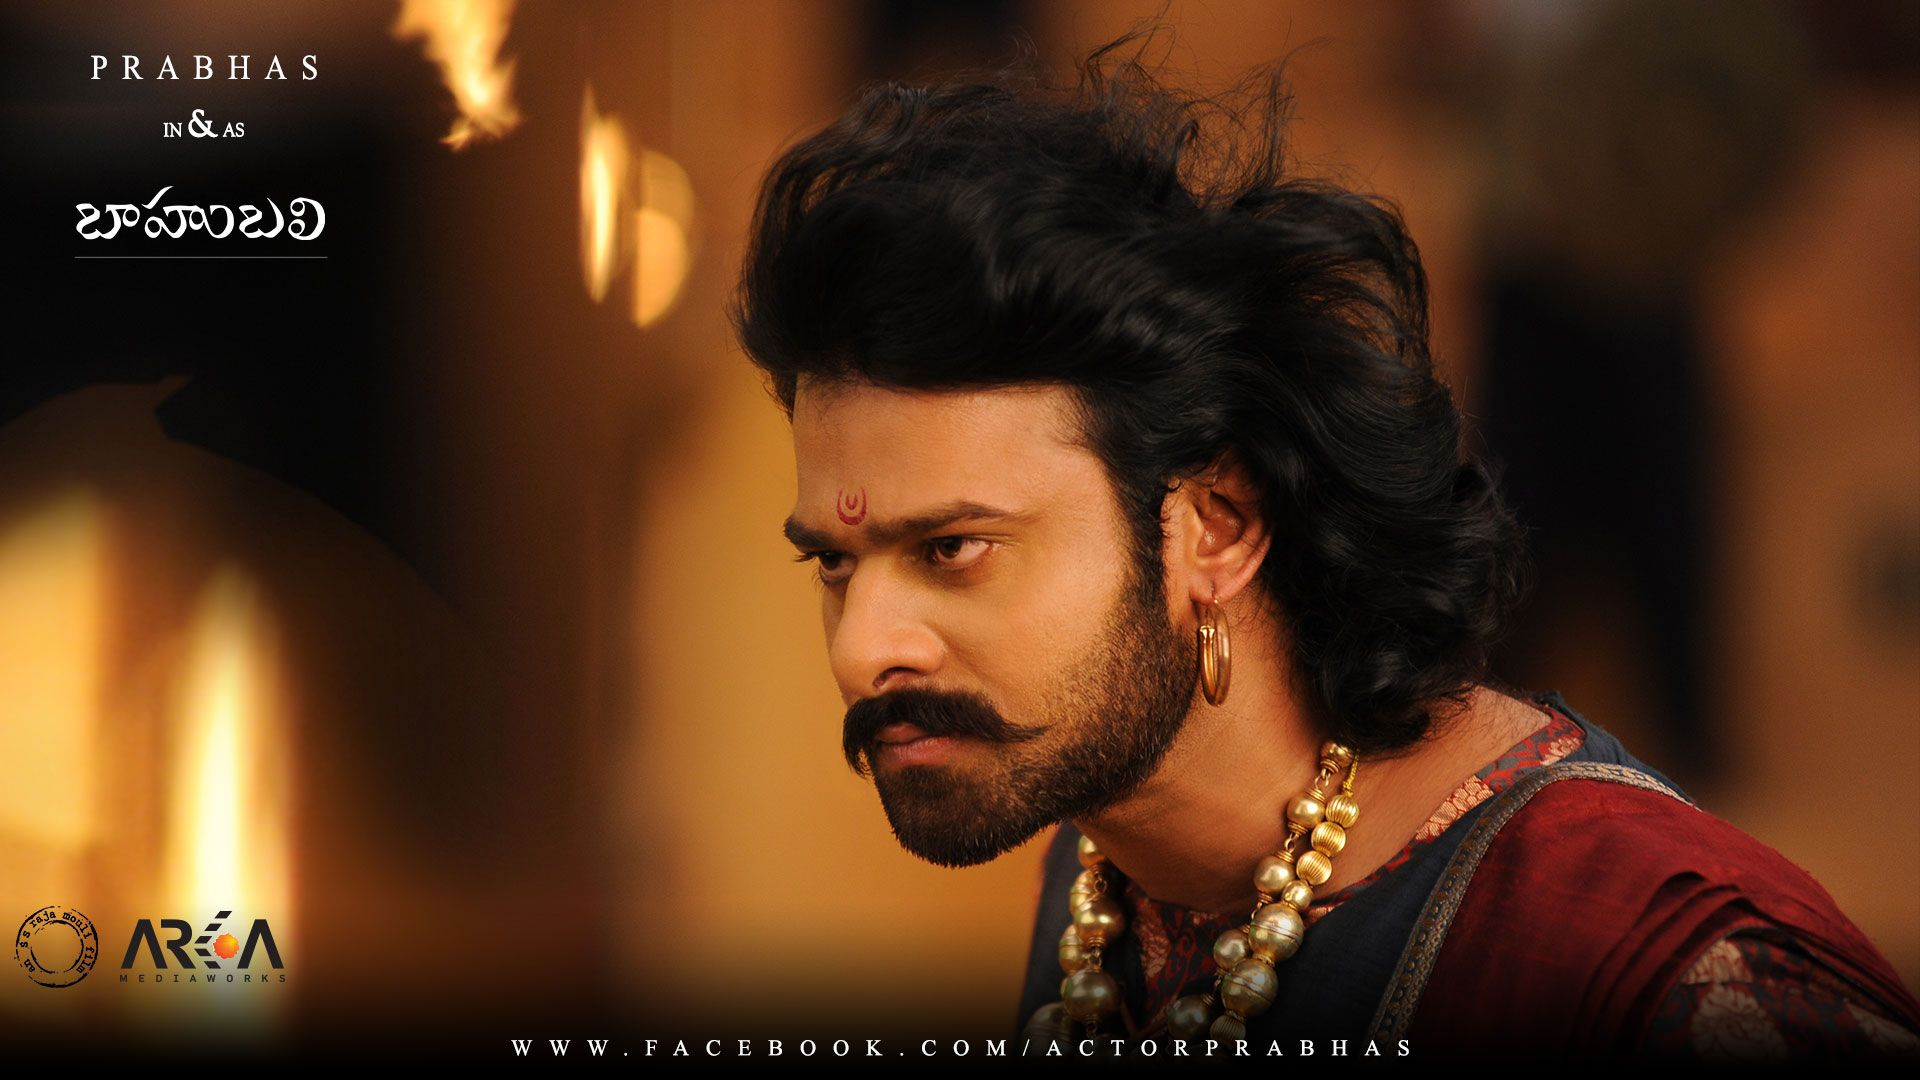 Ba bahubali 2 hd wallpapers - Prabhas In Bahubali Hd Wallpapers Telugu Movie News Telugu